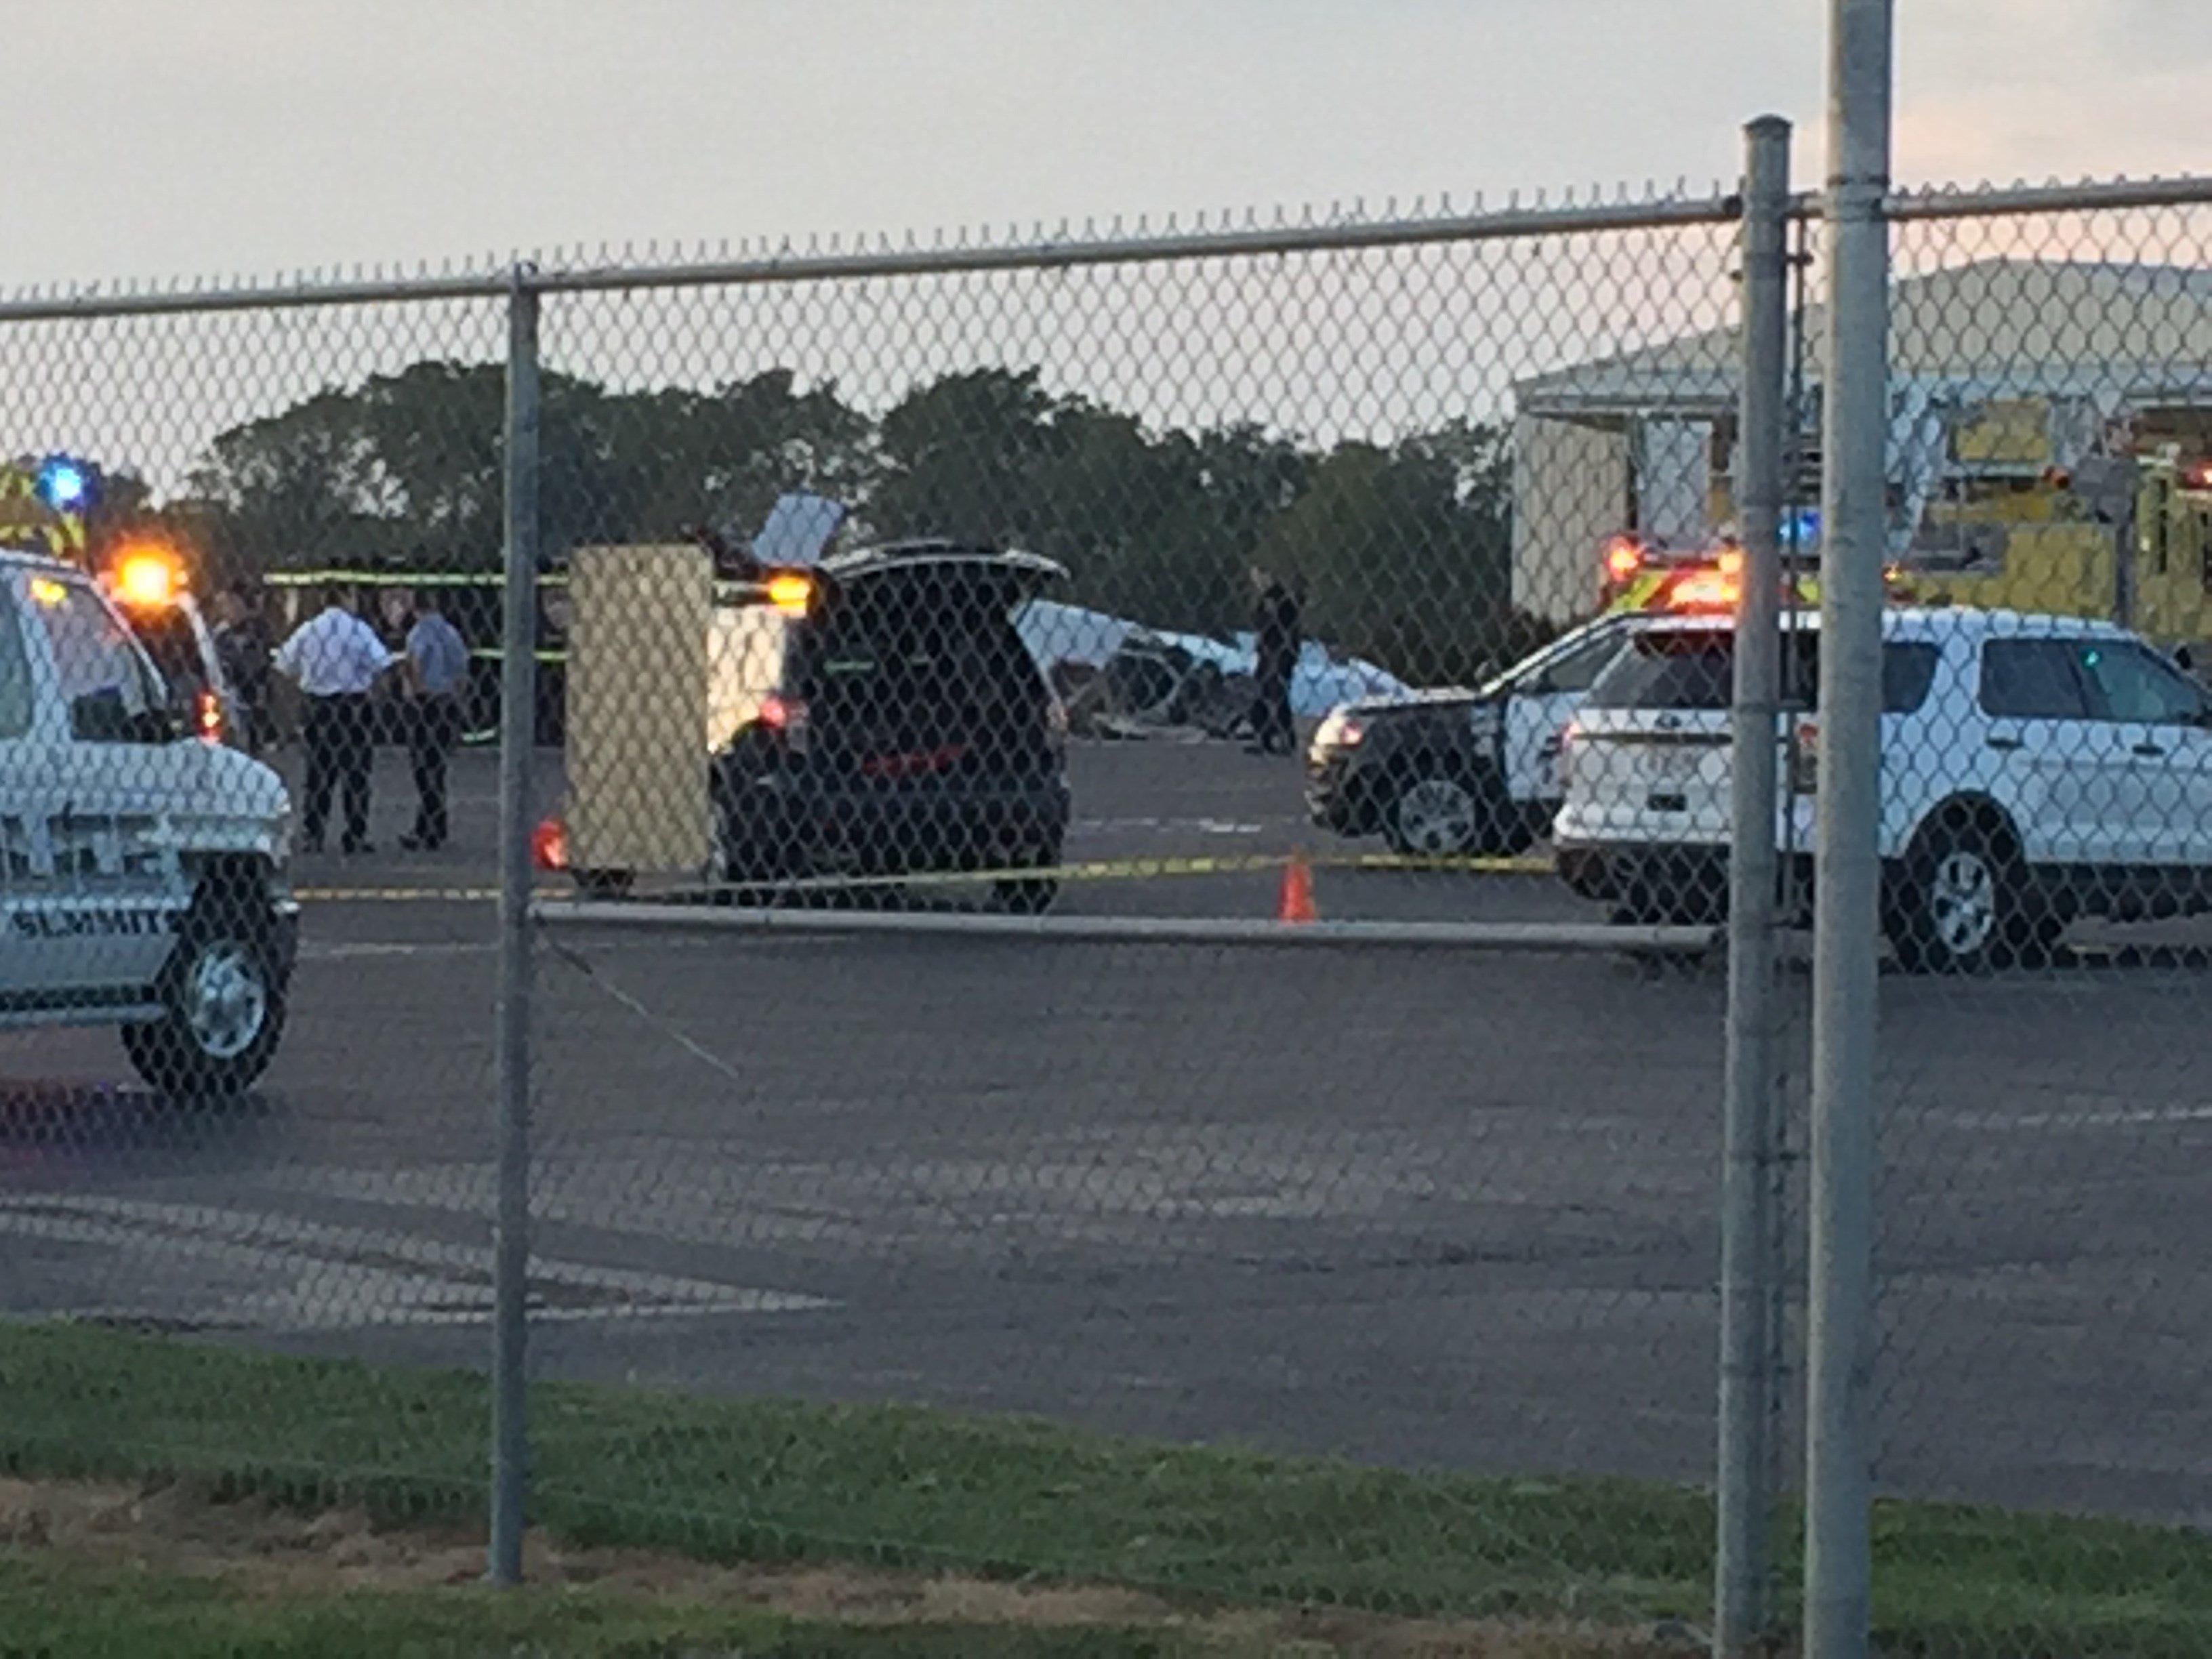 Lee's Summit police say the crash happened around 6:10 p.m. (Edwin Watson/KCTV5)